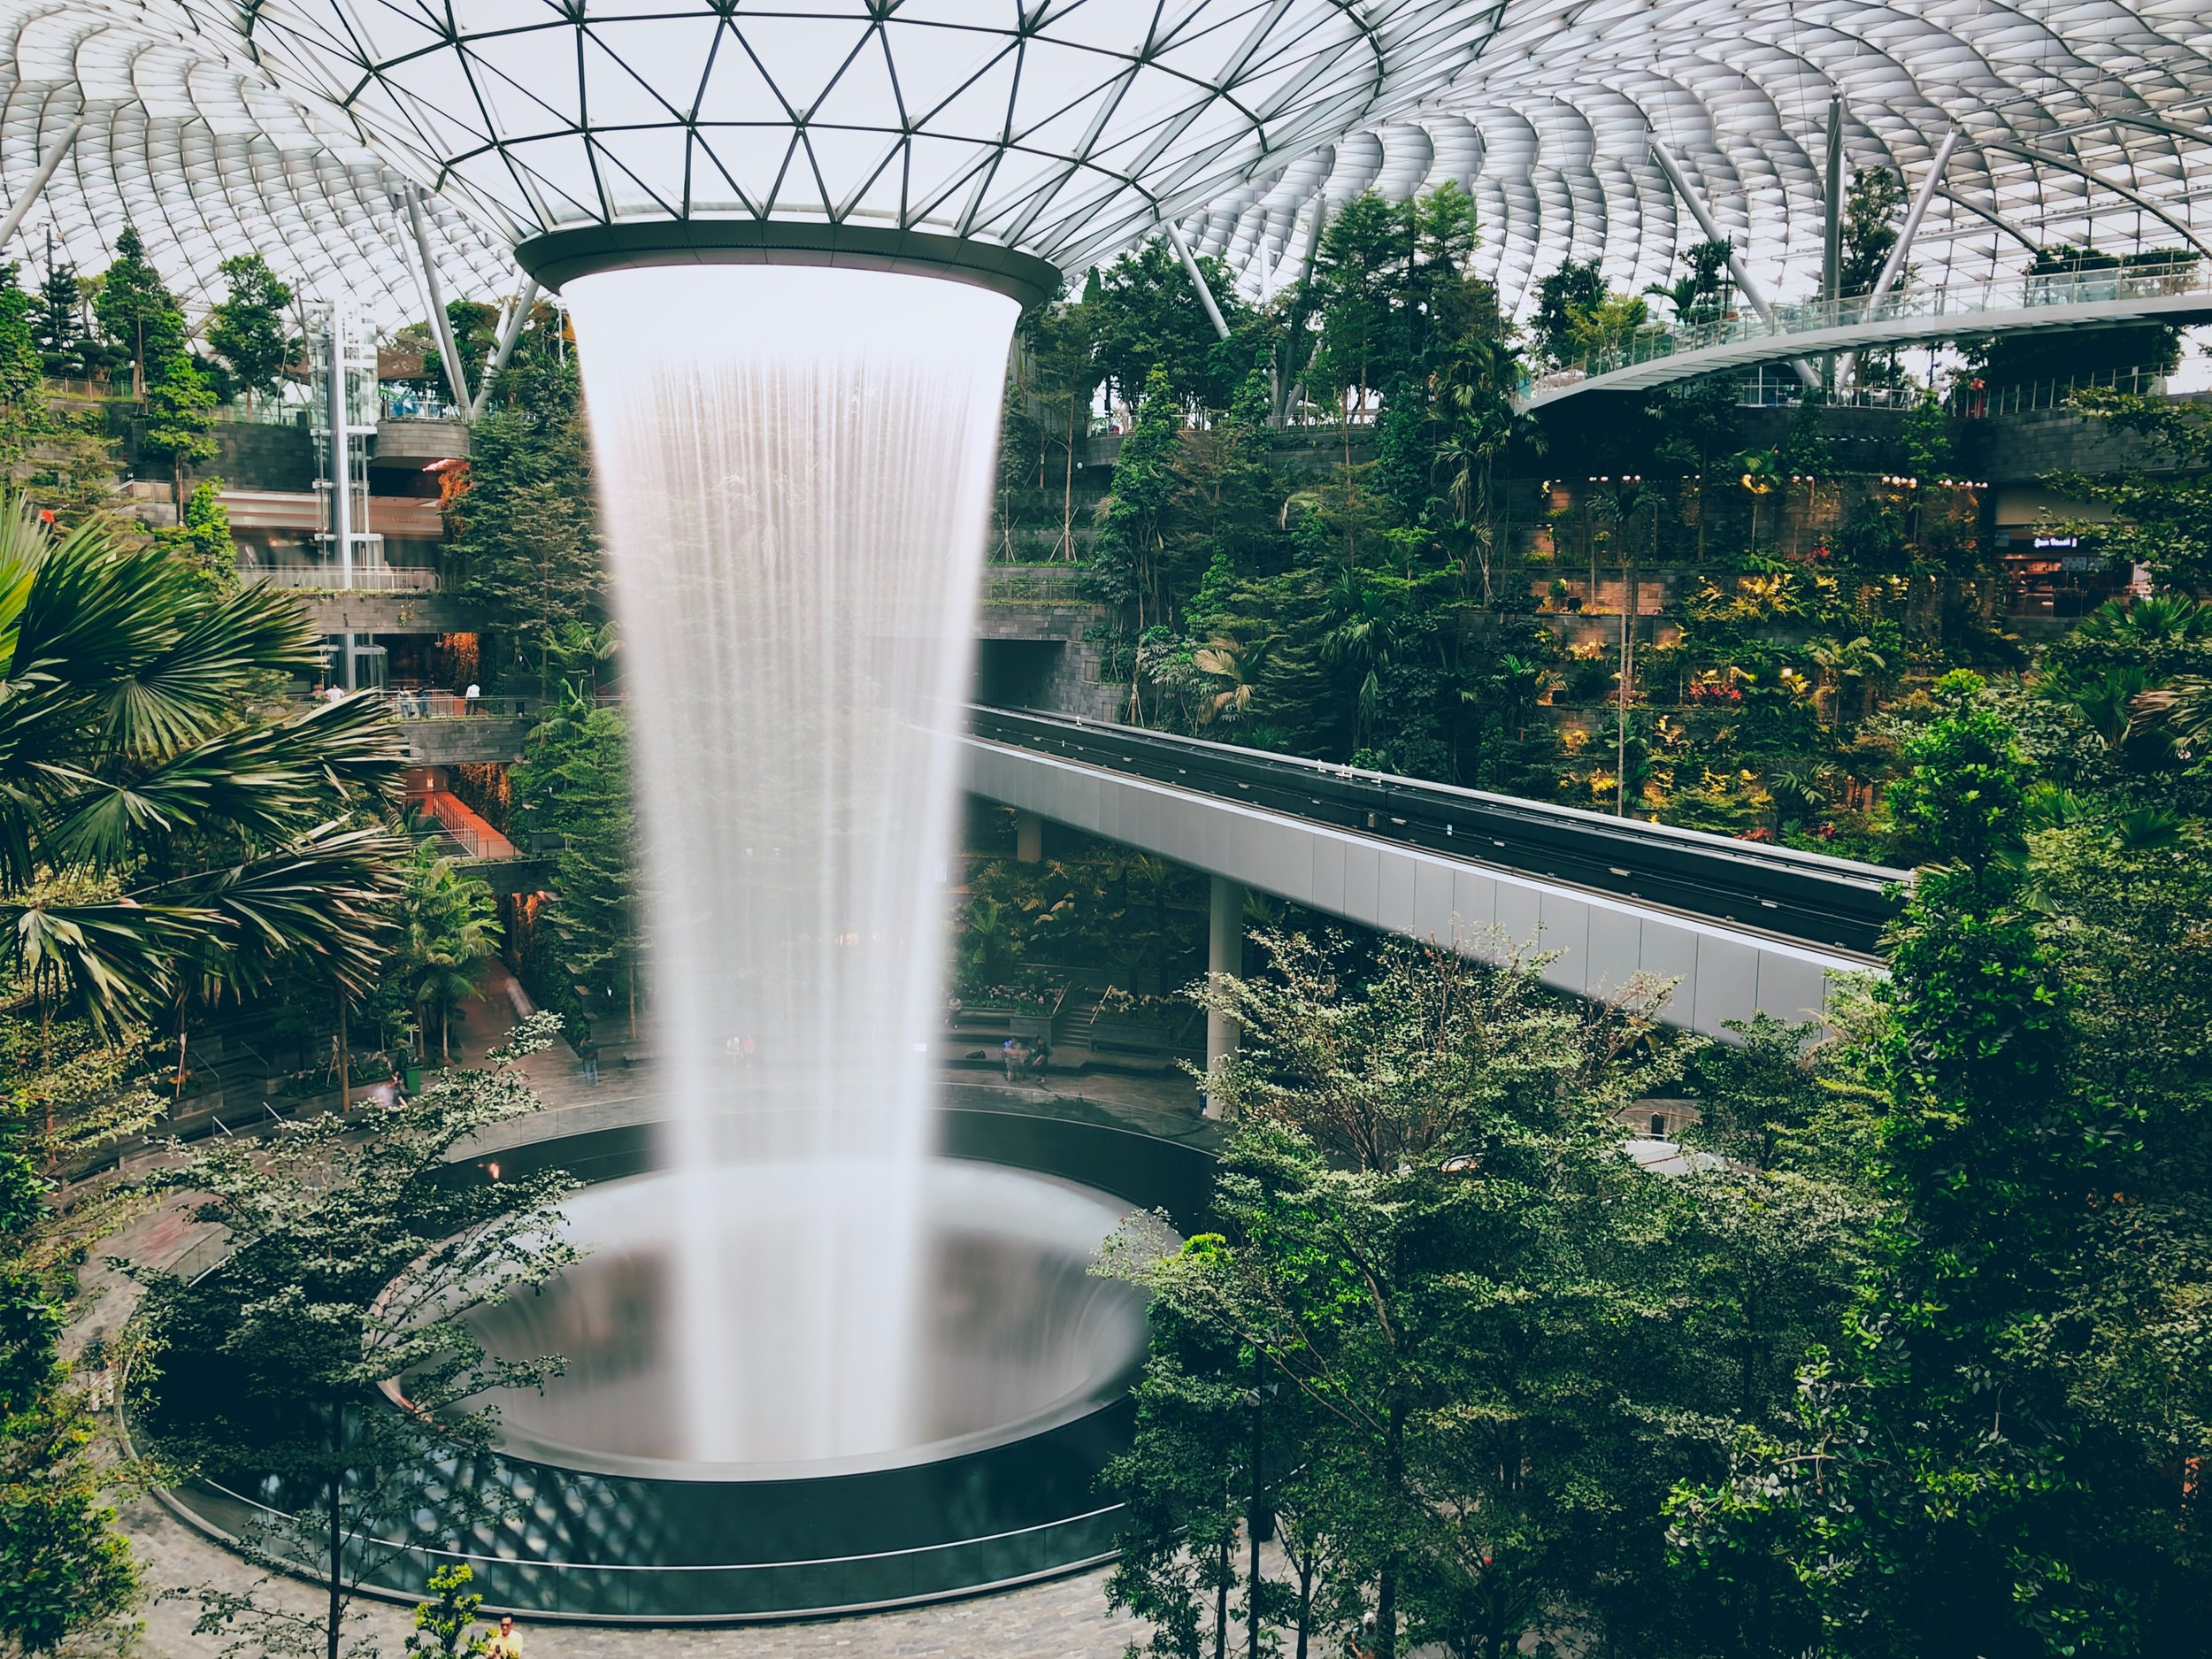 HSBC Rain Vortex at the Jewel Changi Airport